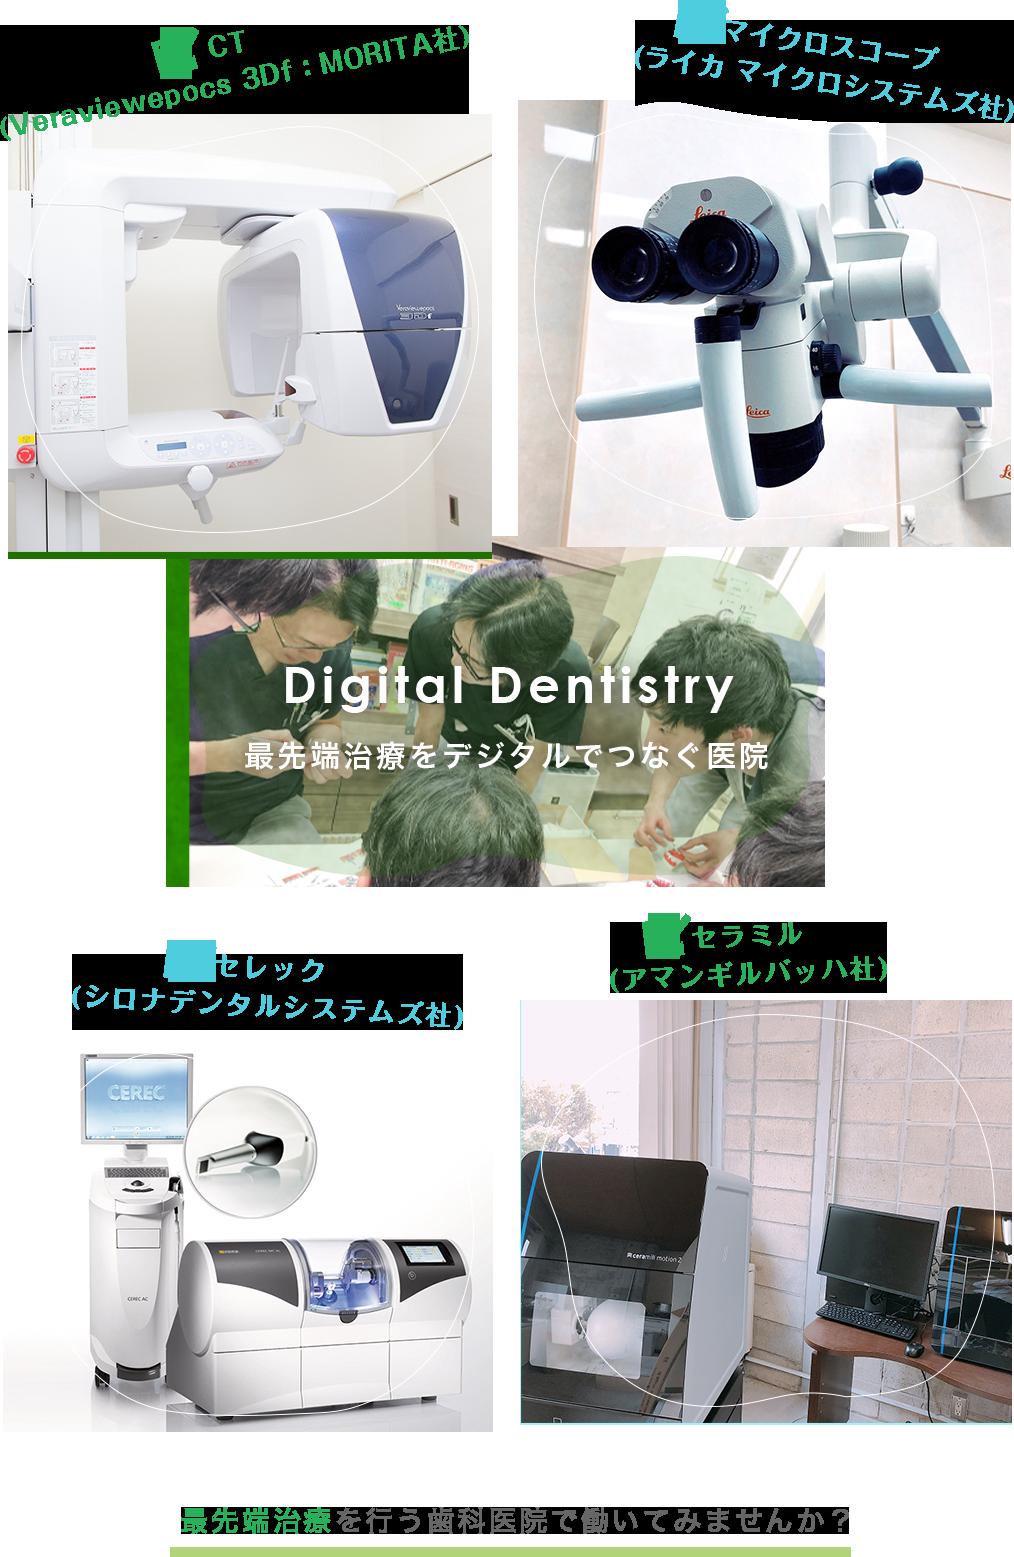 Digital Dentistry 小室歯科が求める人材 最先端治療をデジタルでつなぐ医院